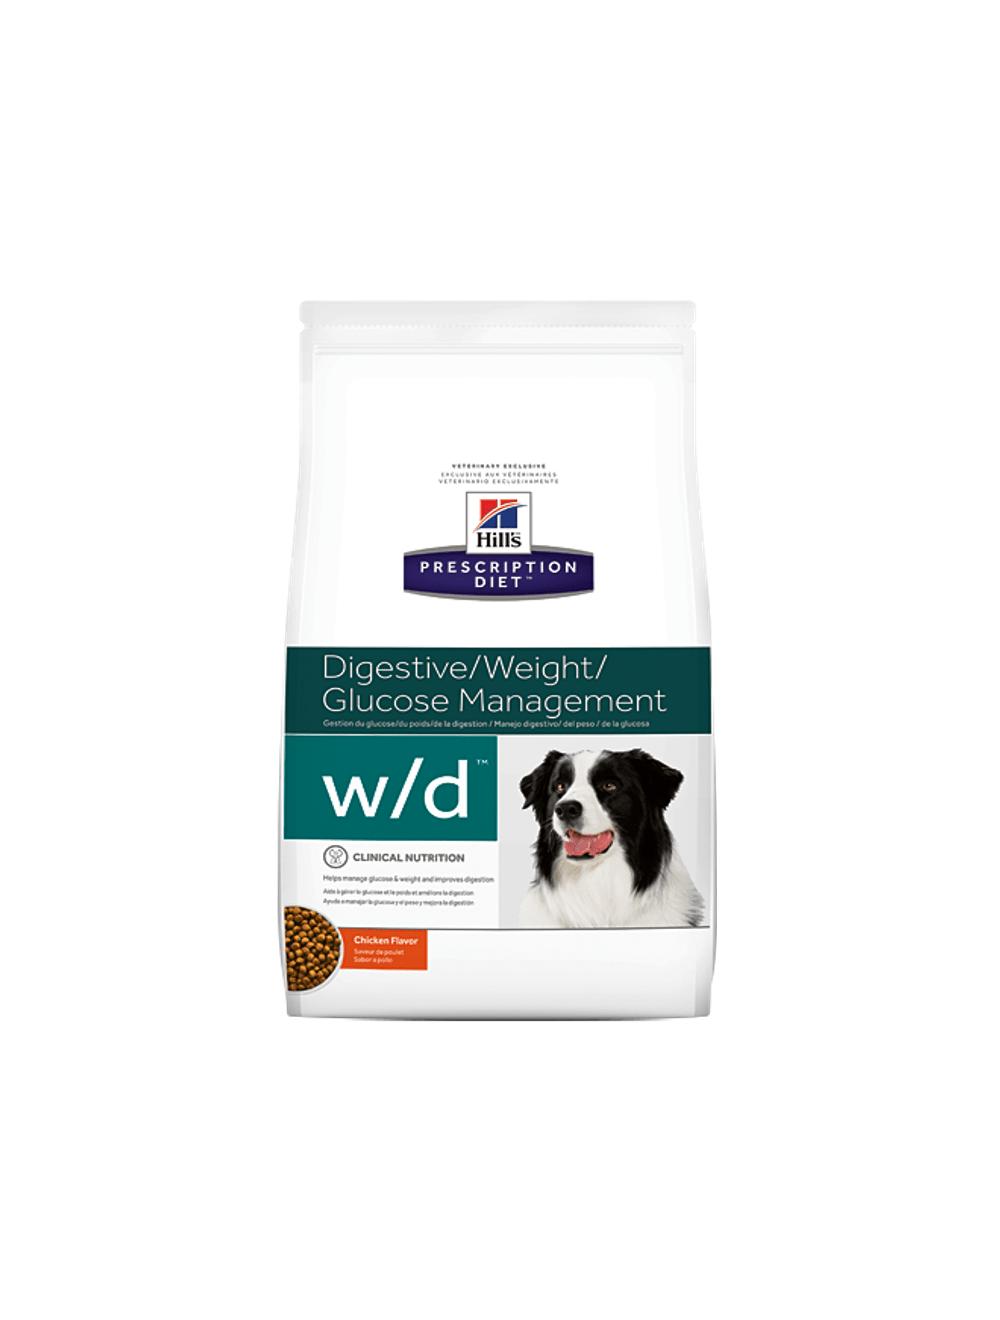 Comida para perro Hill's W/D 1.5 Kg - ciudaddemascotas.com